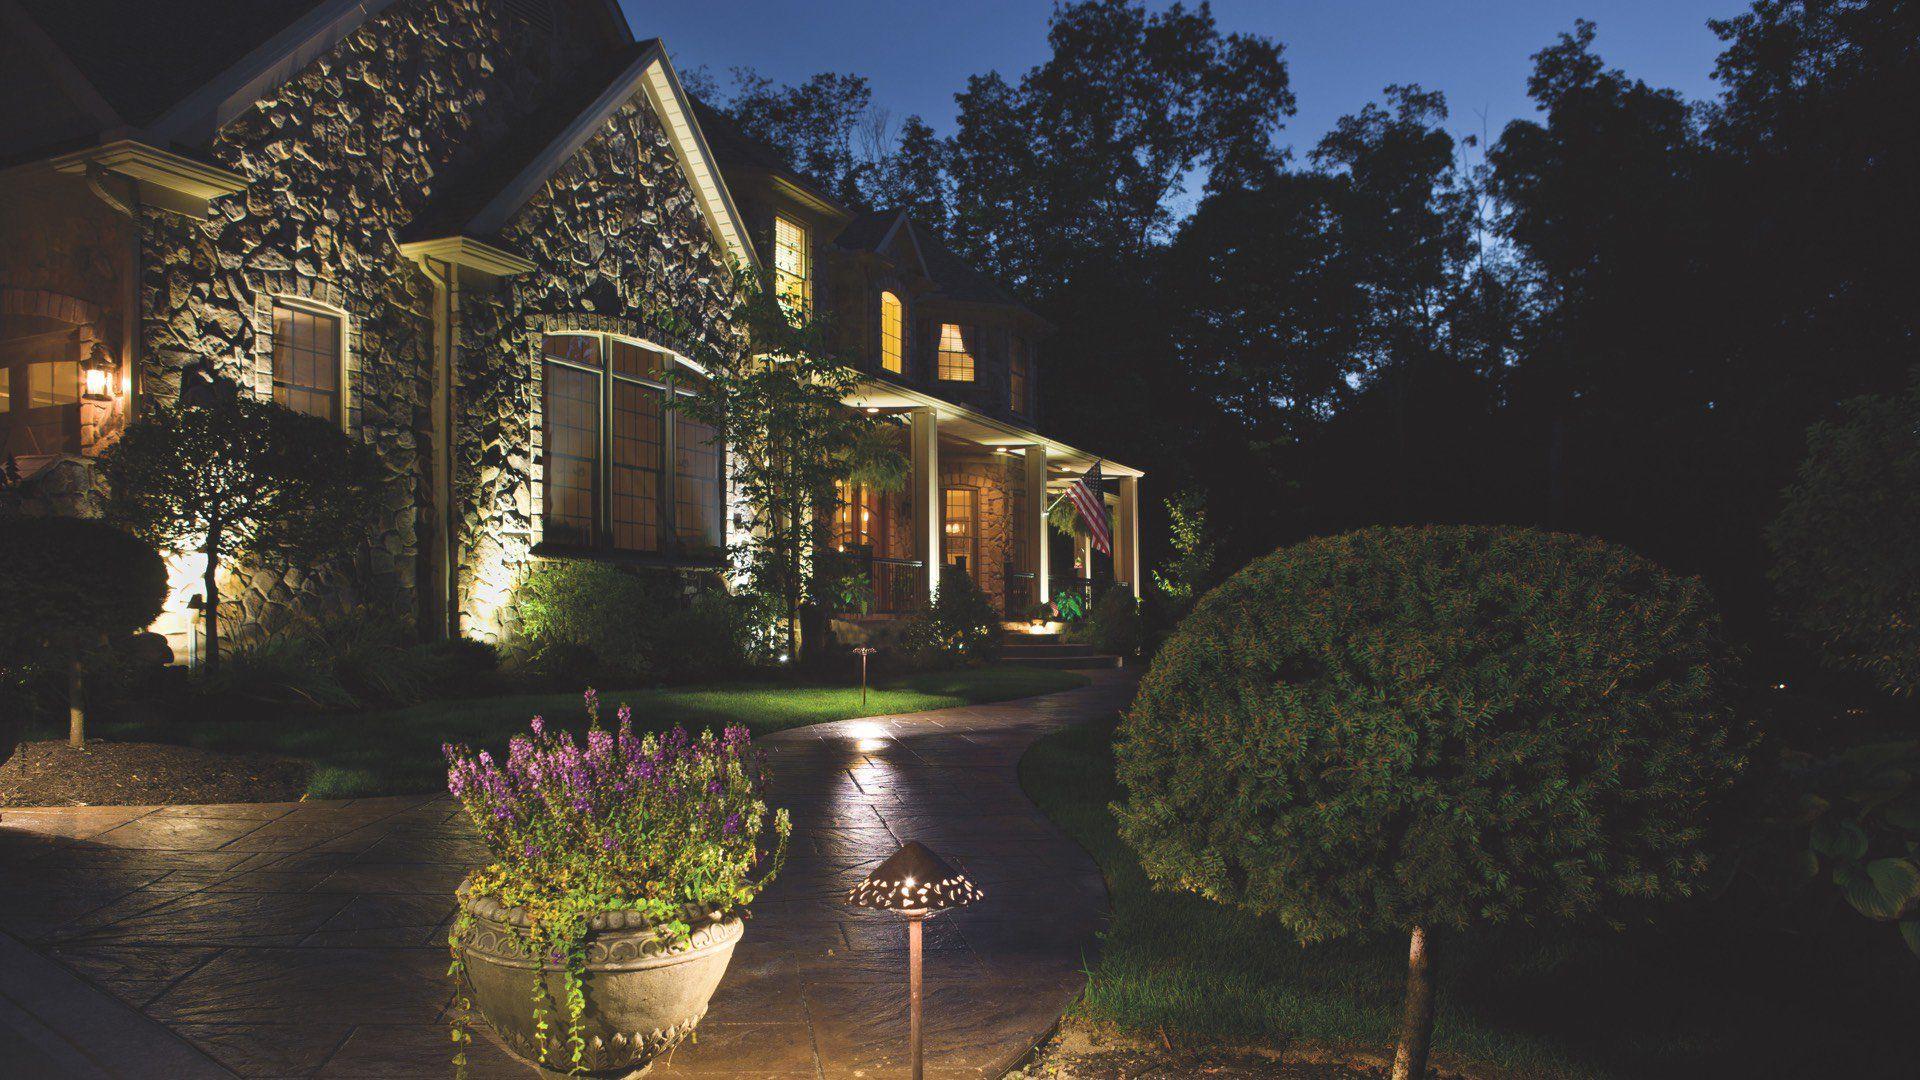 Wall Wash Lighting With Images Landscape Lighting Outdoor Landscape Lighting Landscape Lighting Design